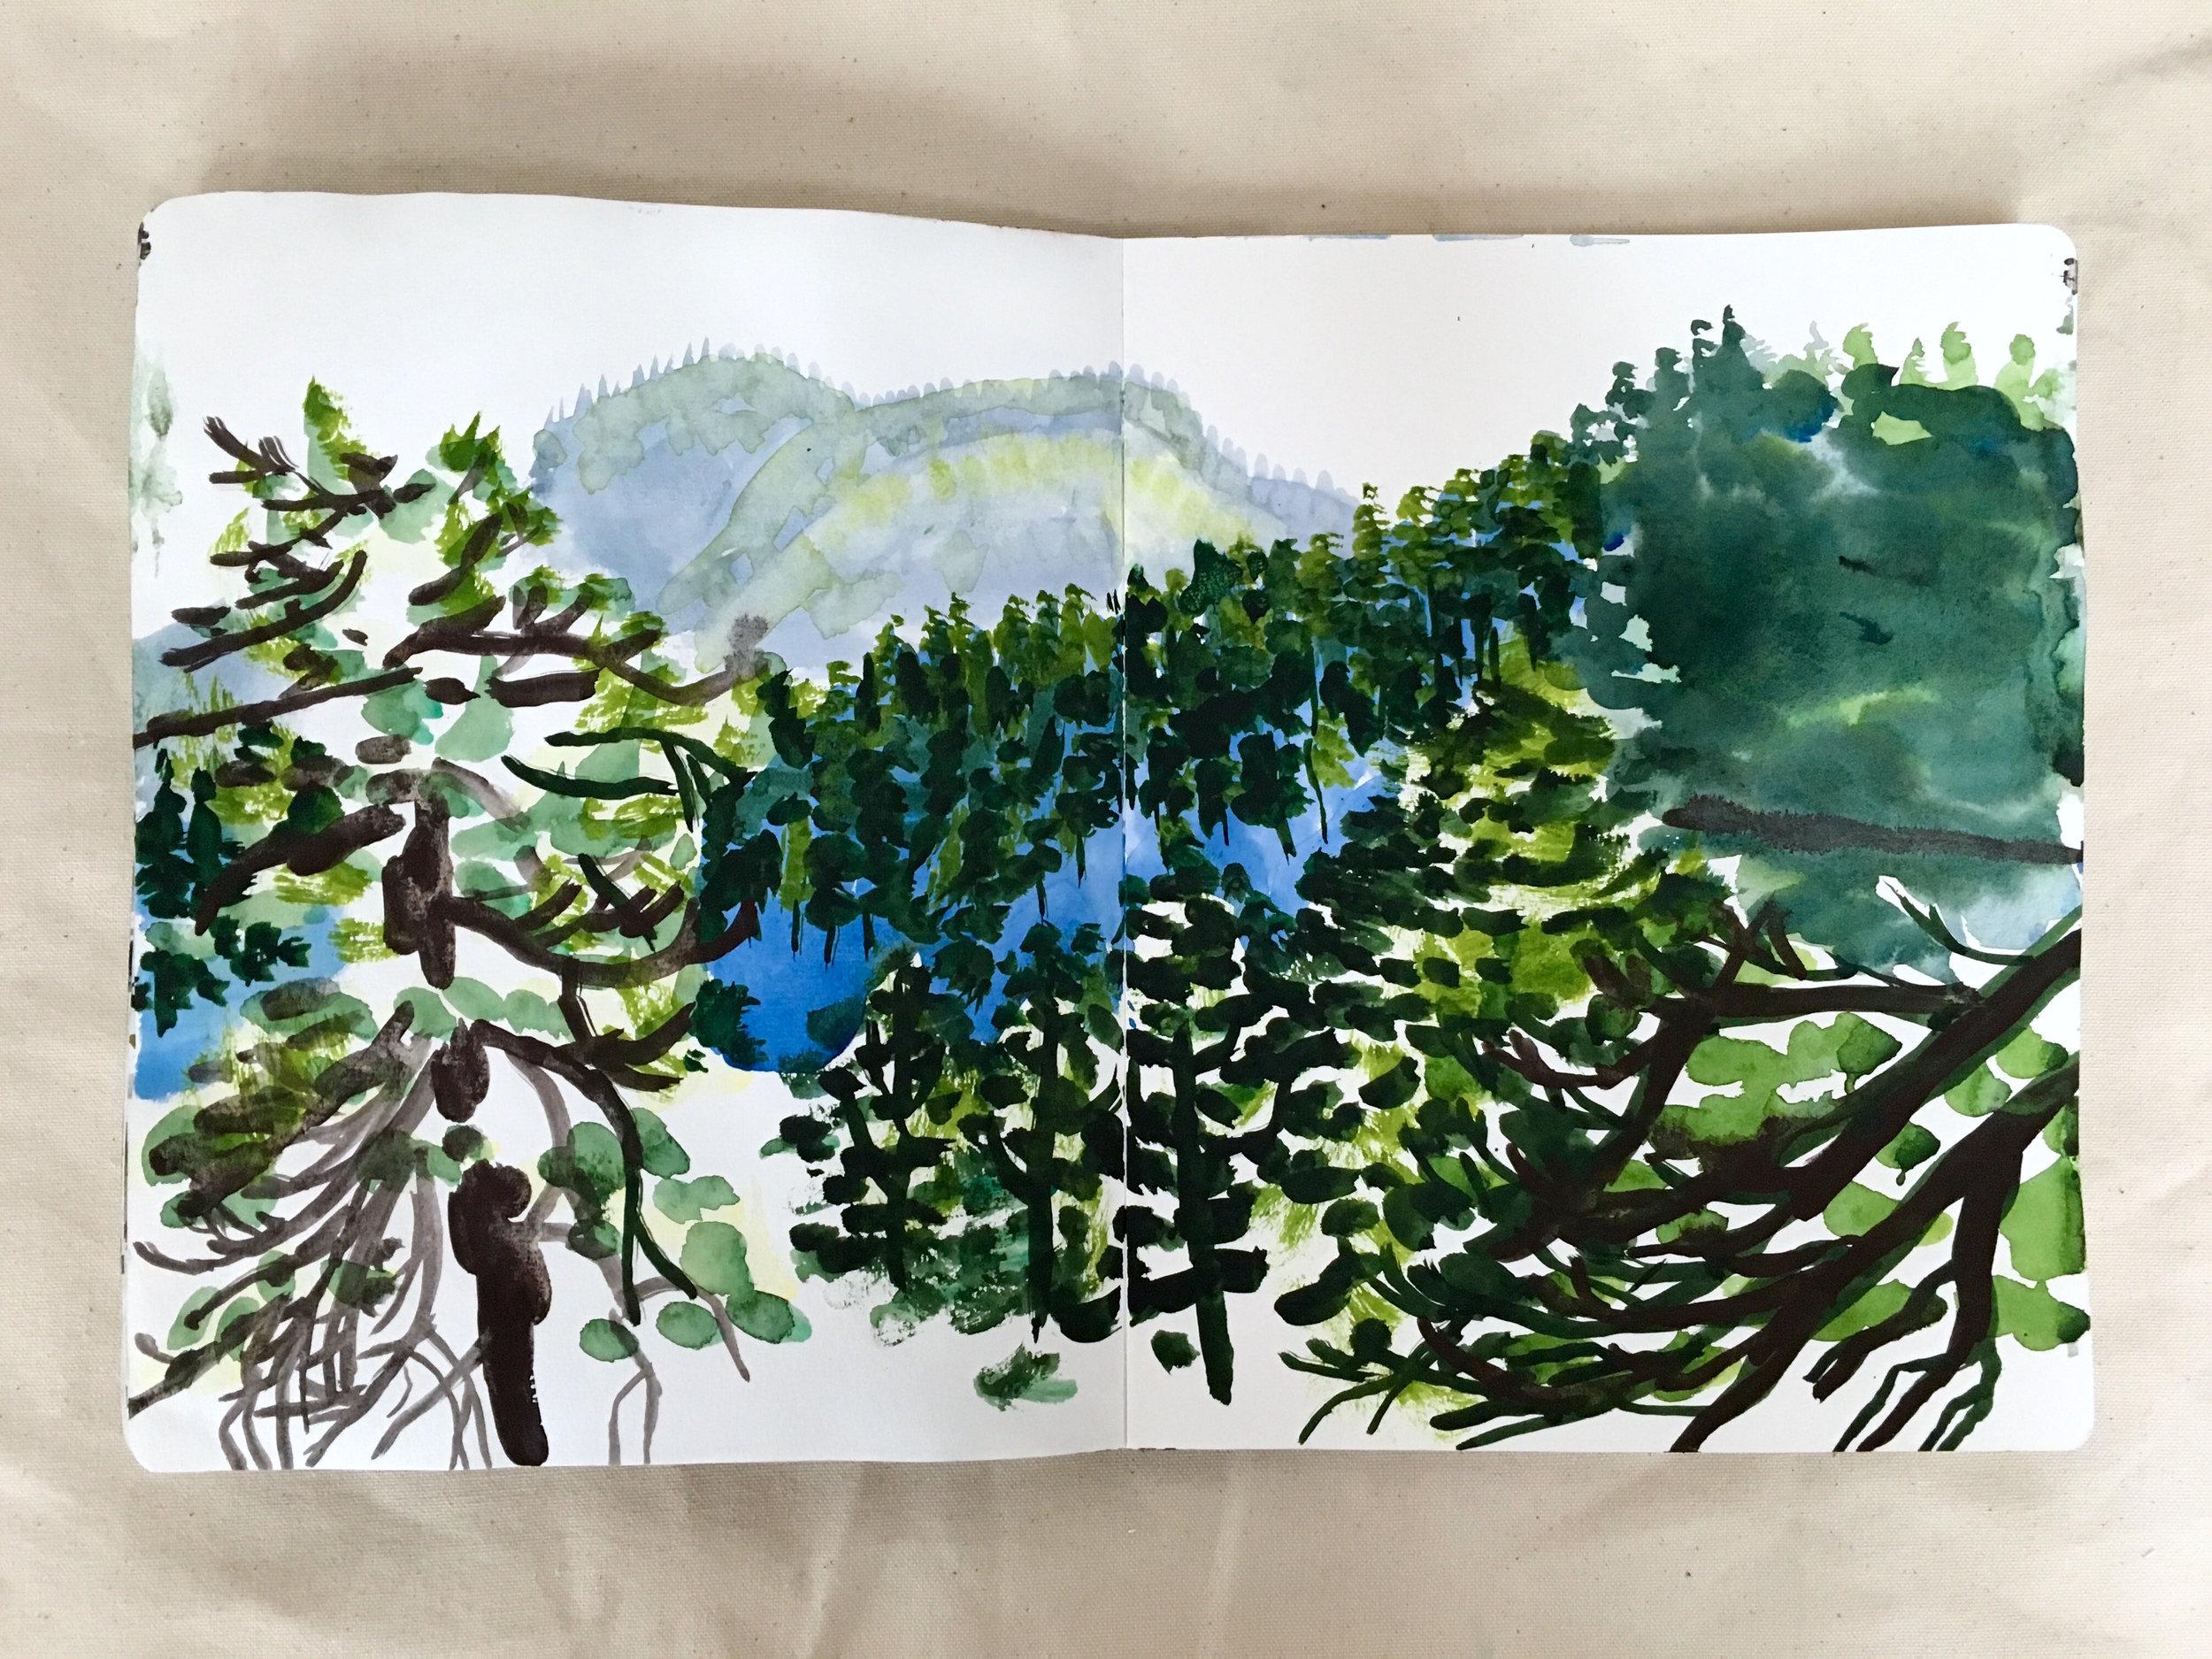 sunny-winter-trees-hills